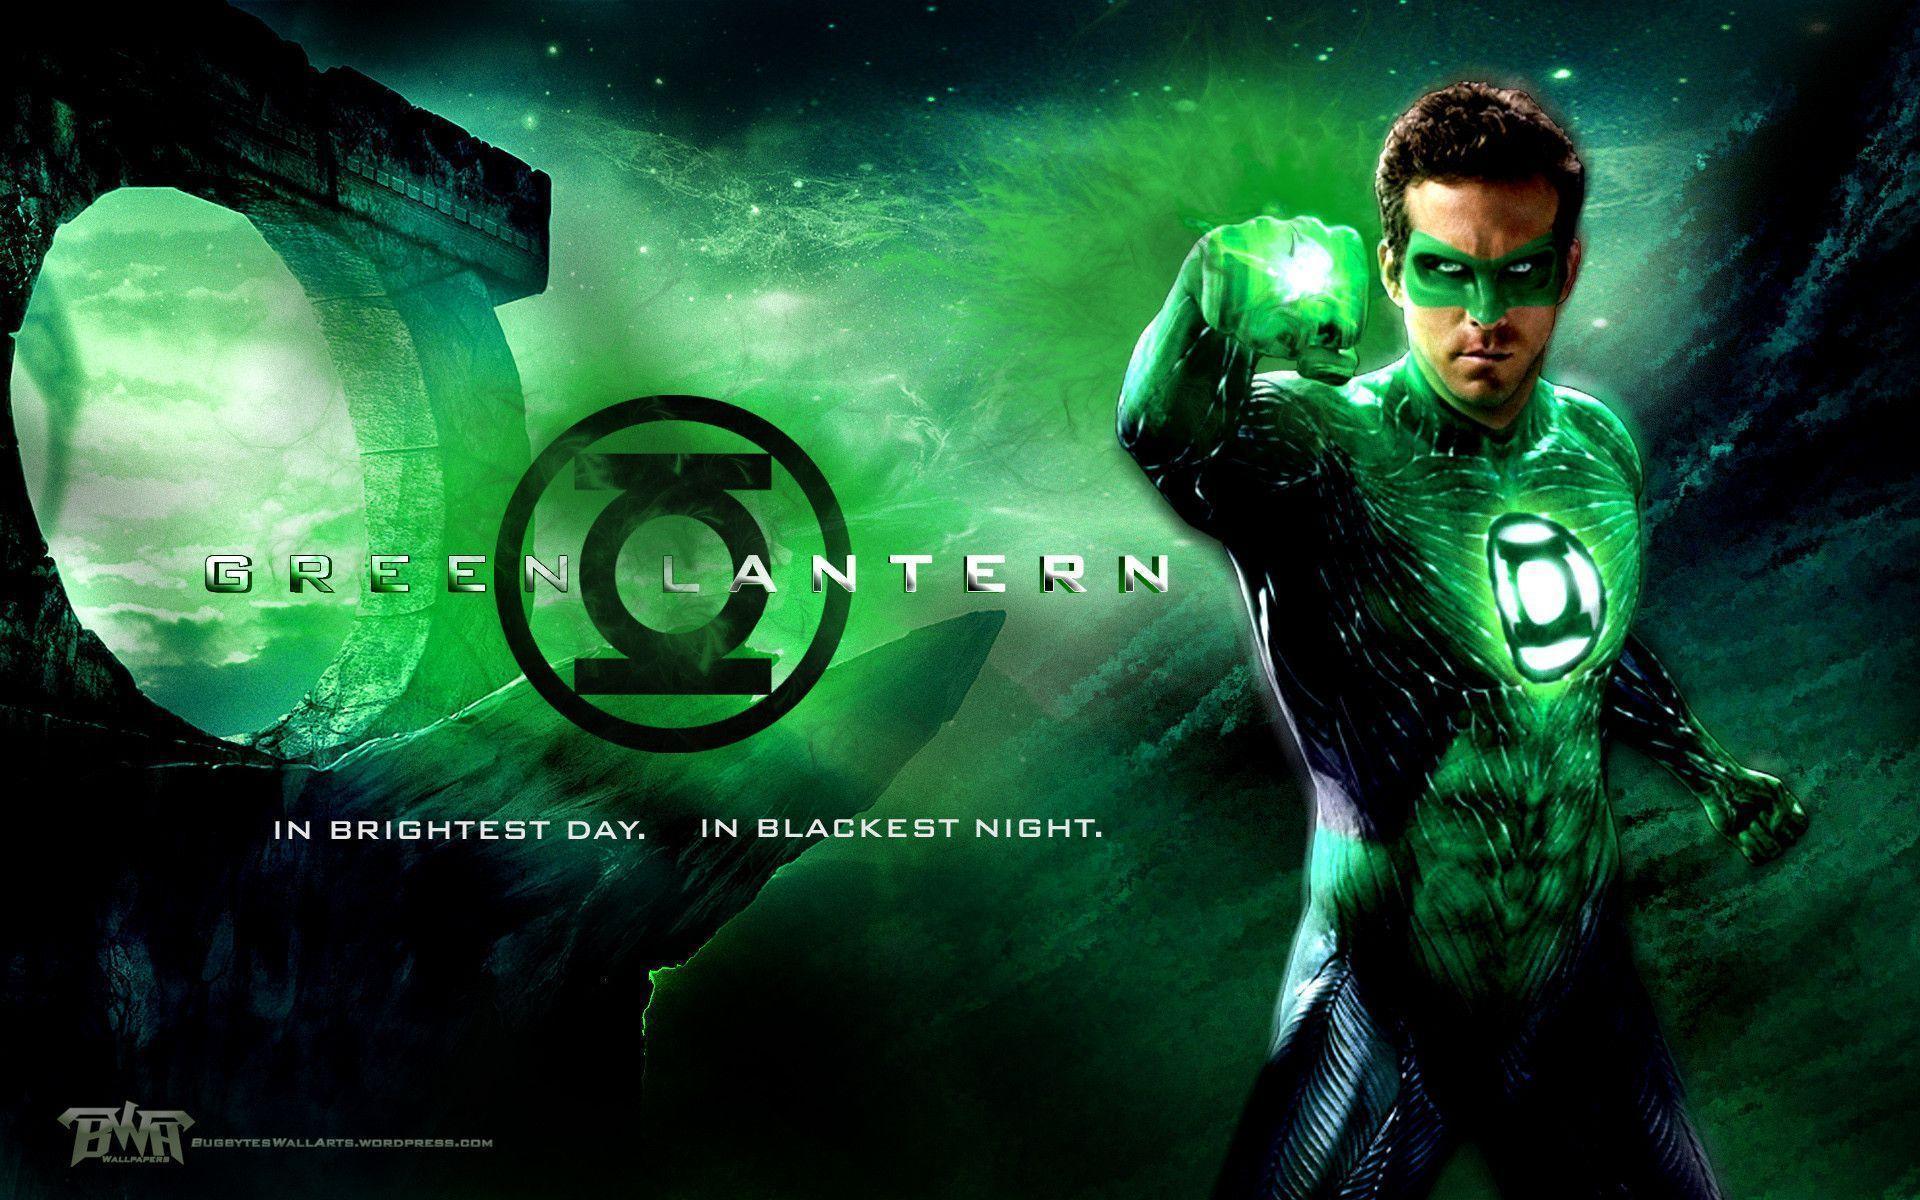 Green Lantern Comic Wallpaper: Green Lantern Wallpapers